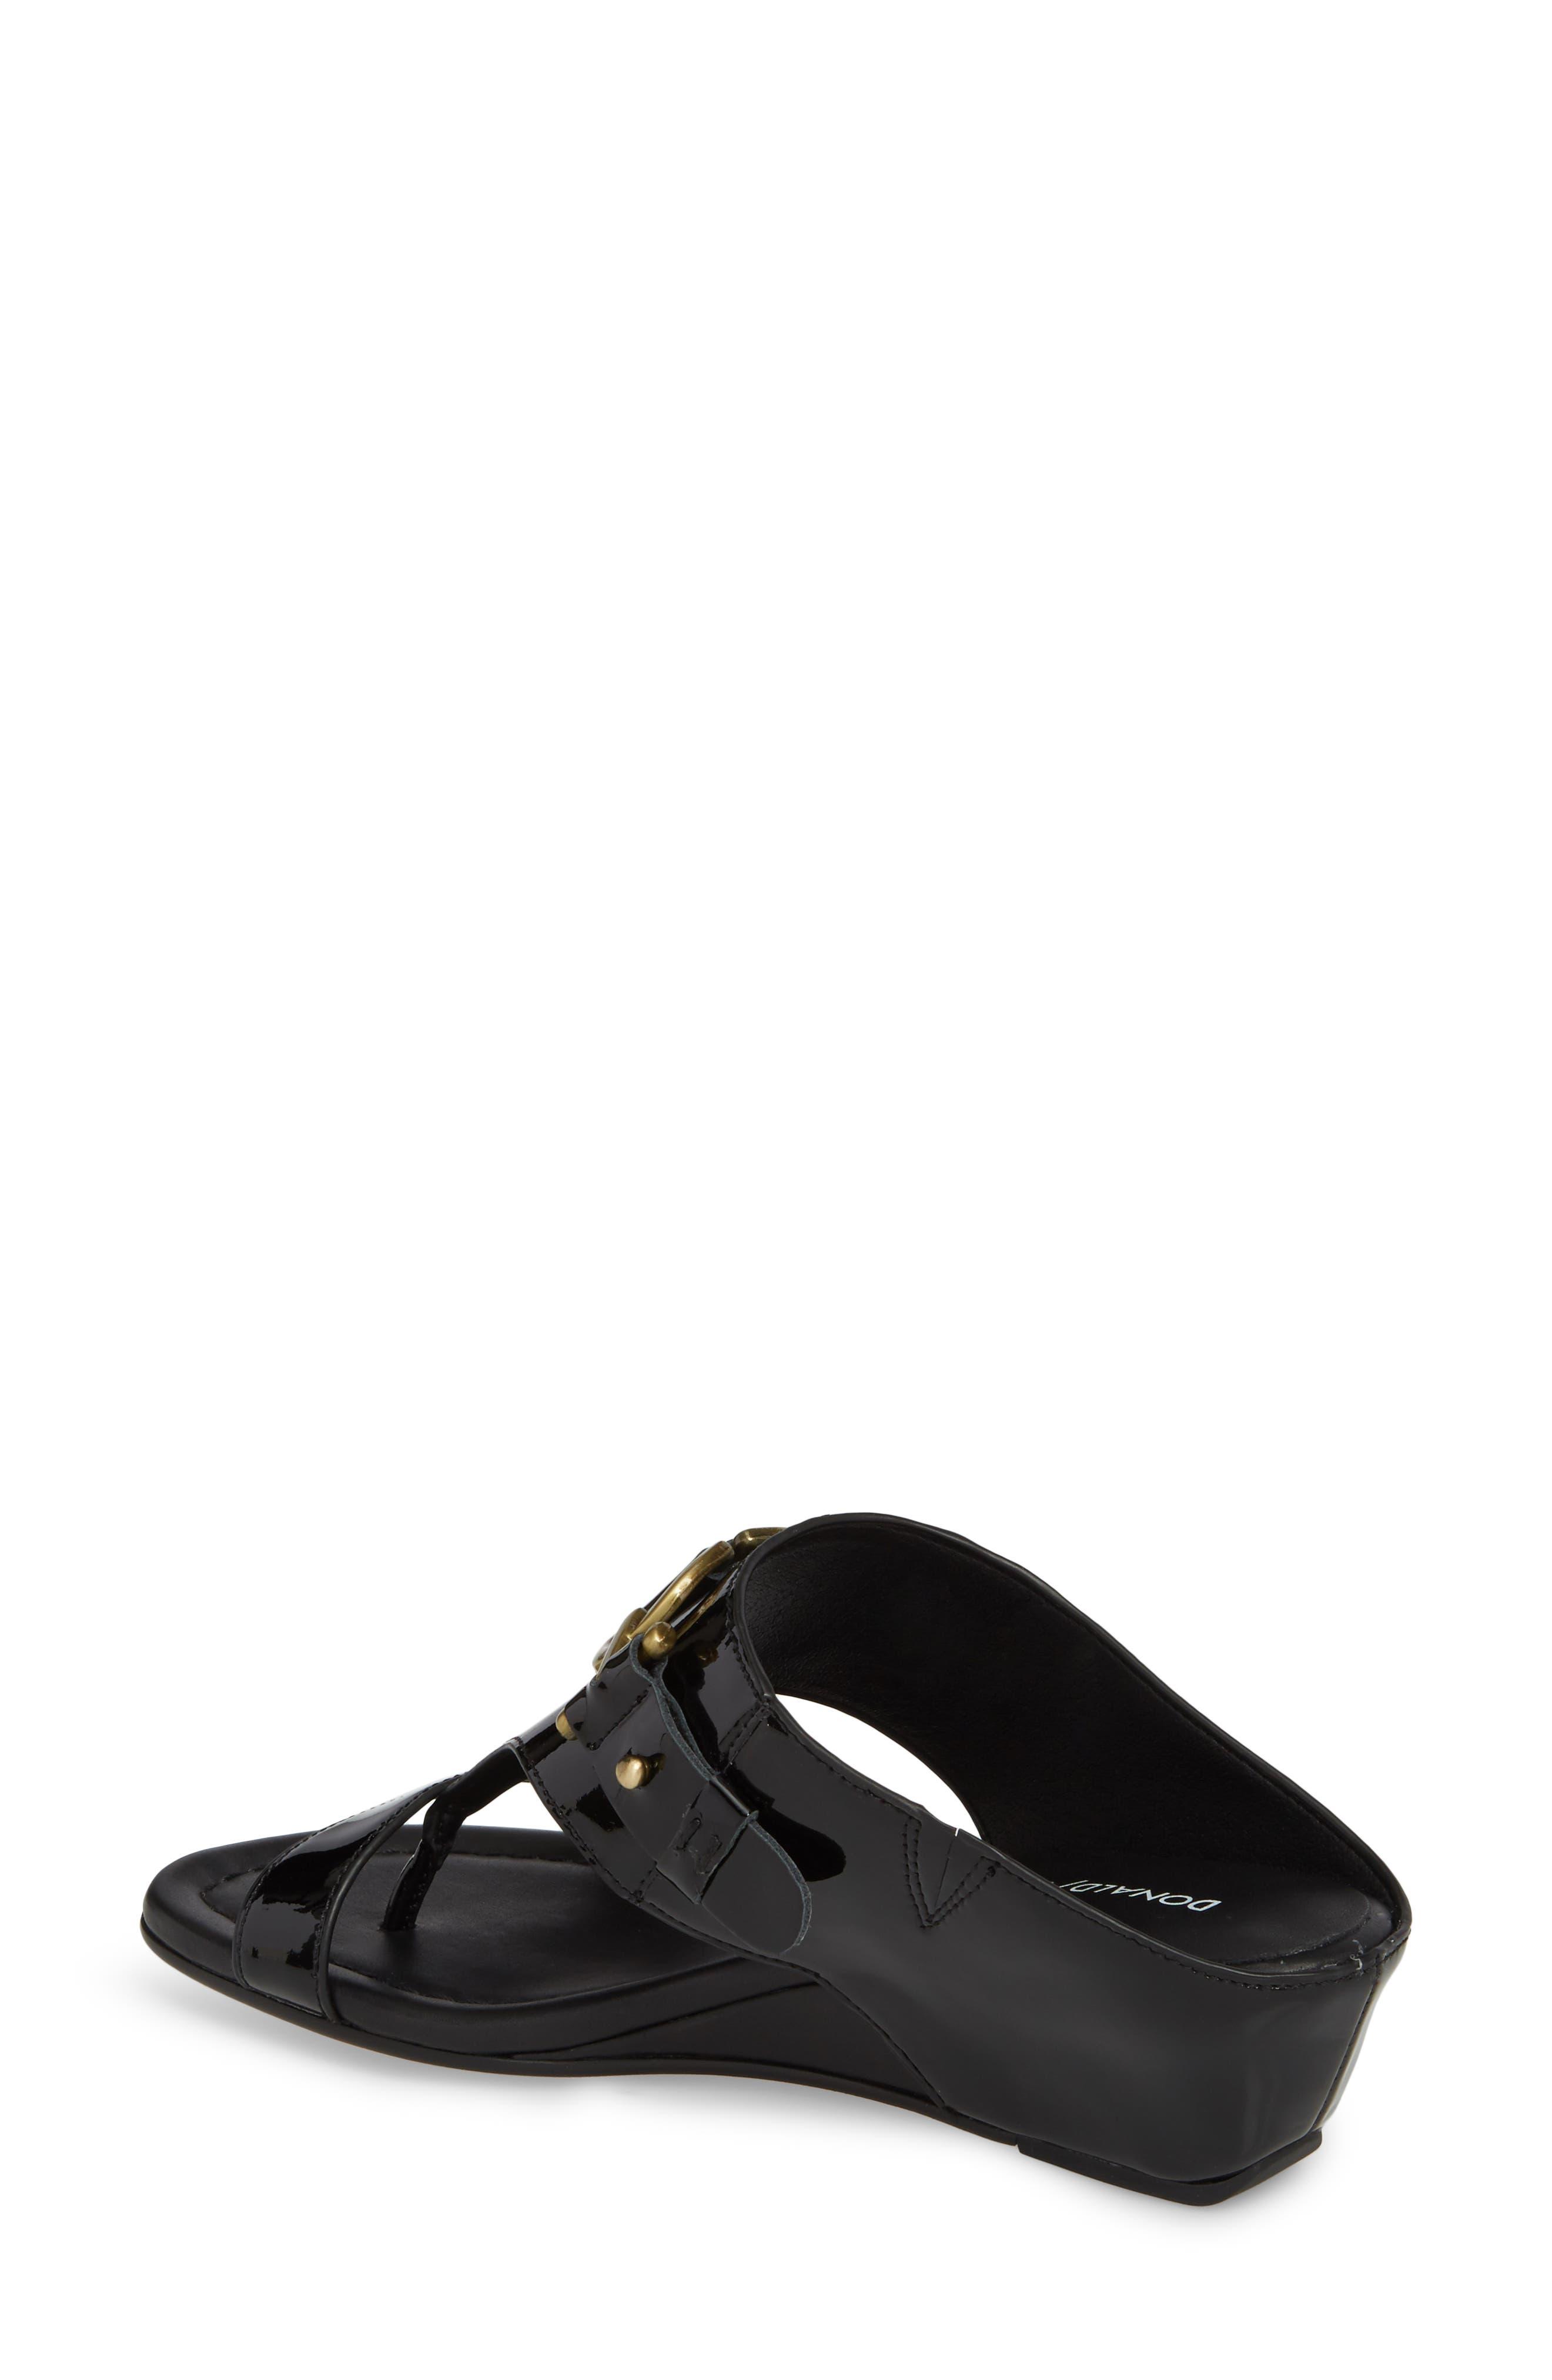 Dayna Wedge Sandal,                             Alternate thumbnail 2, color,                             Black Leather